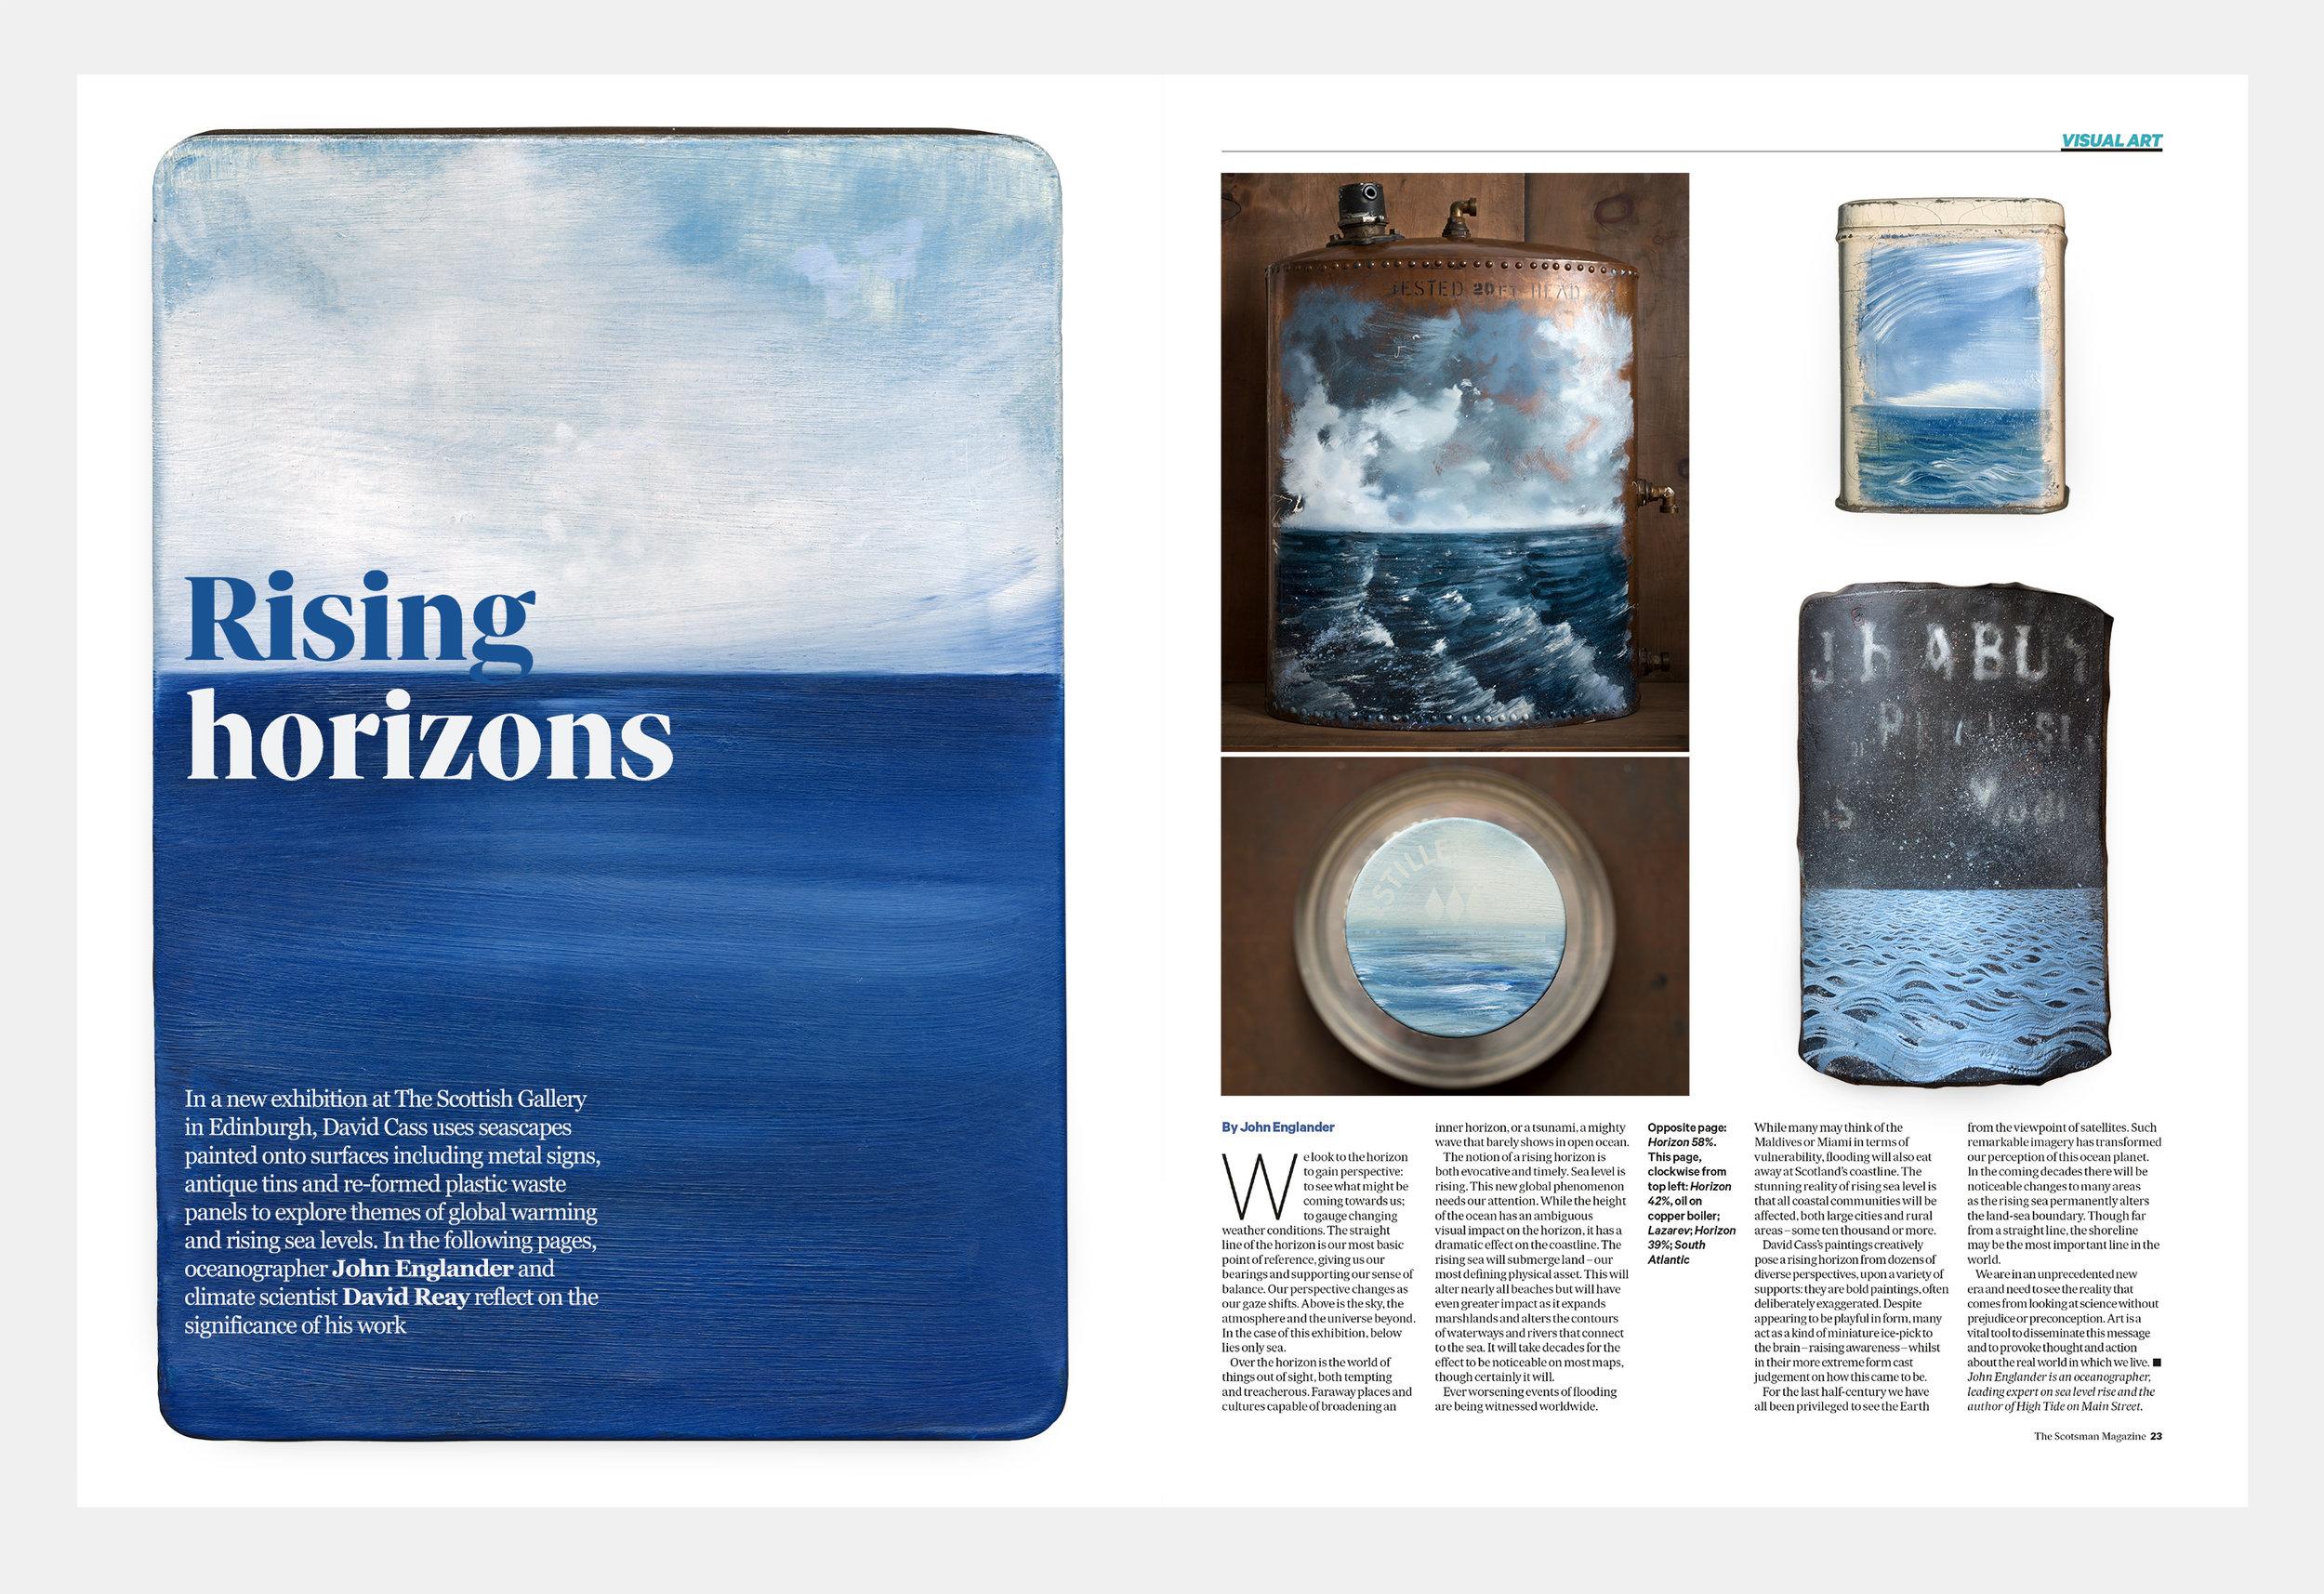 The Scotsman Magazine, David Cass